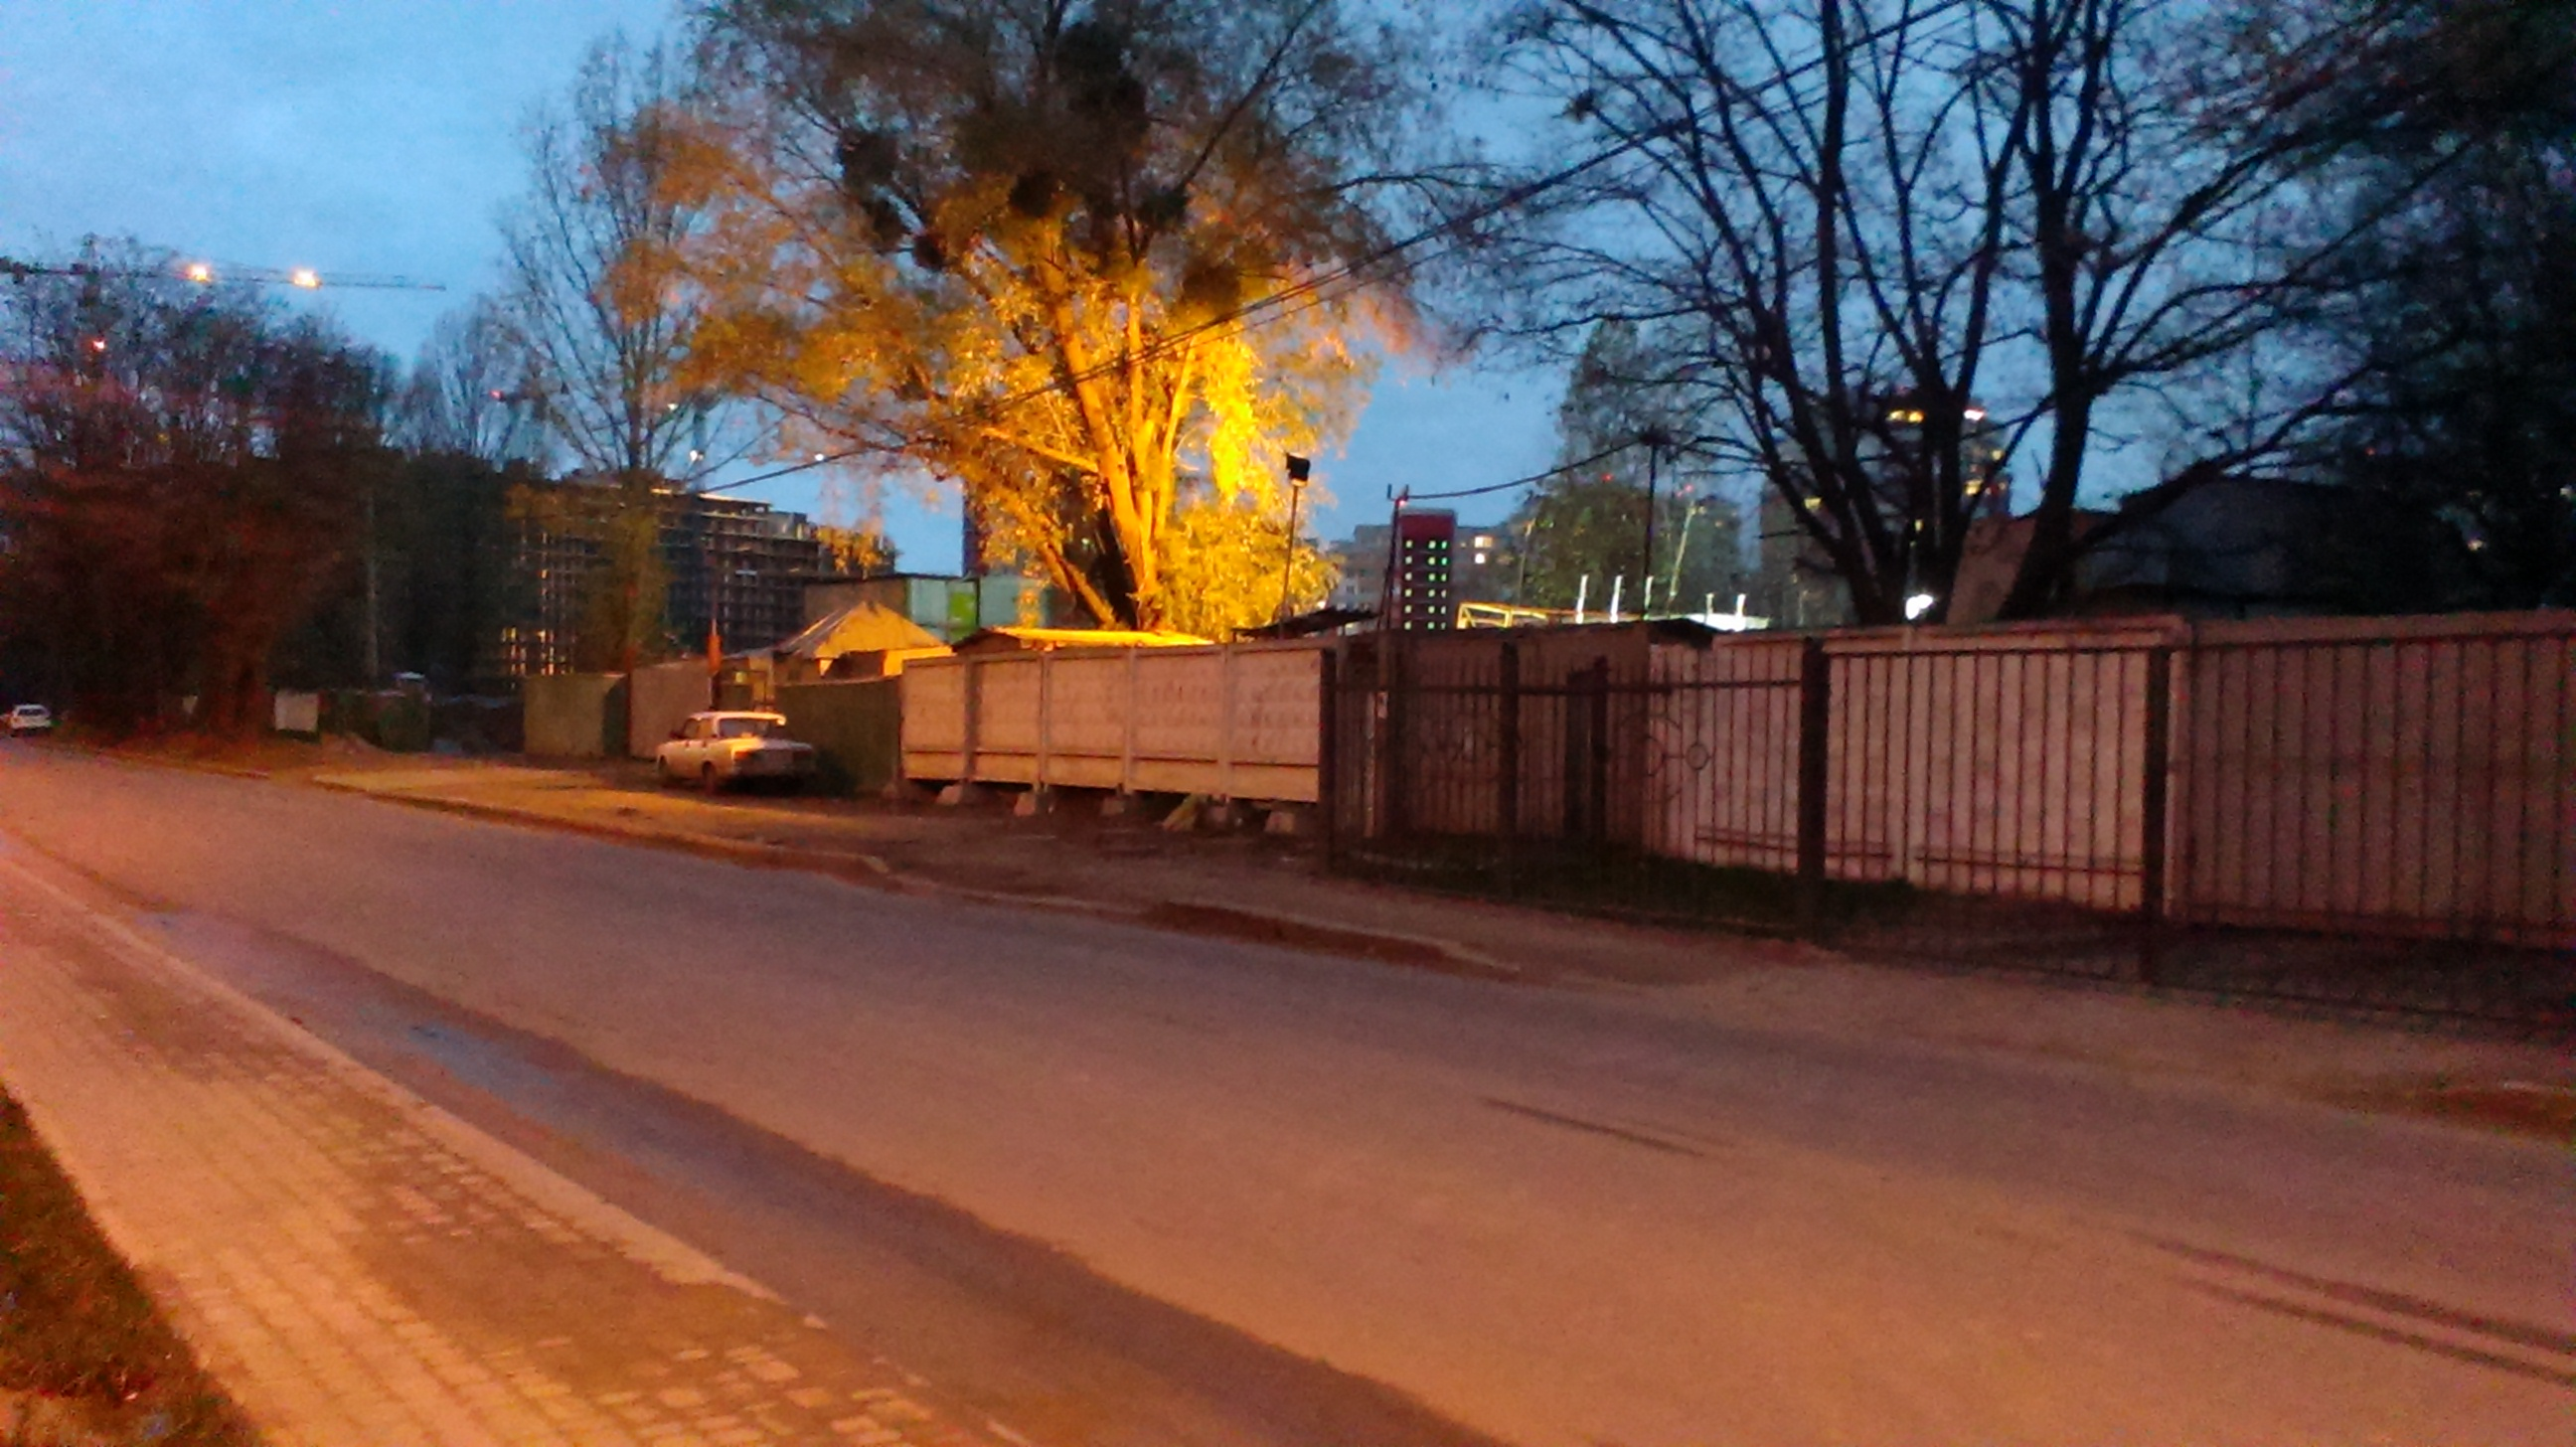 HTC Desire 601 photo sample-1